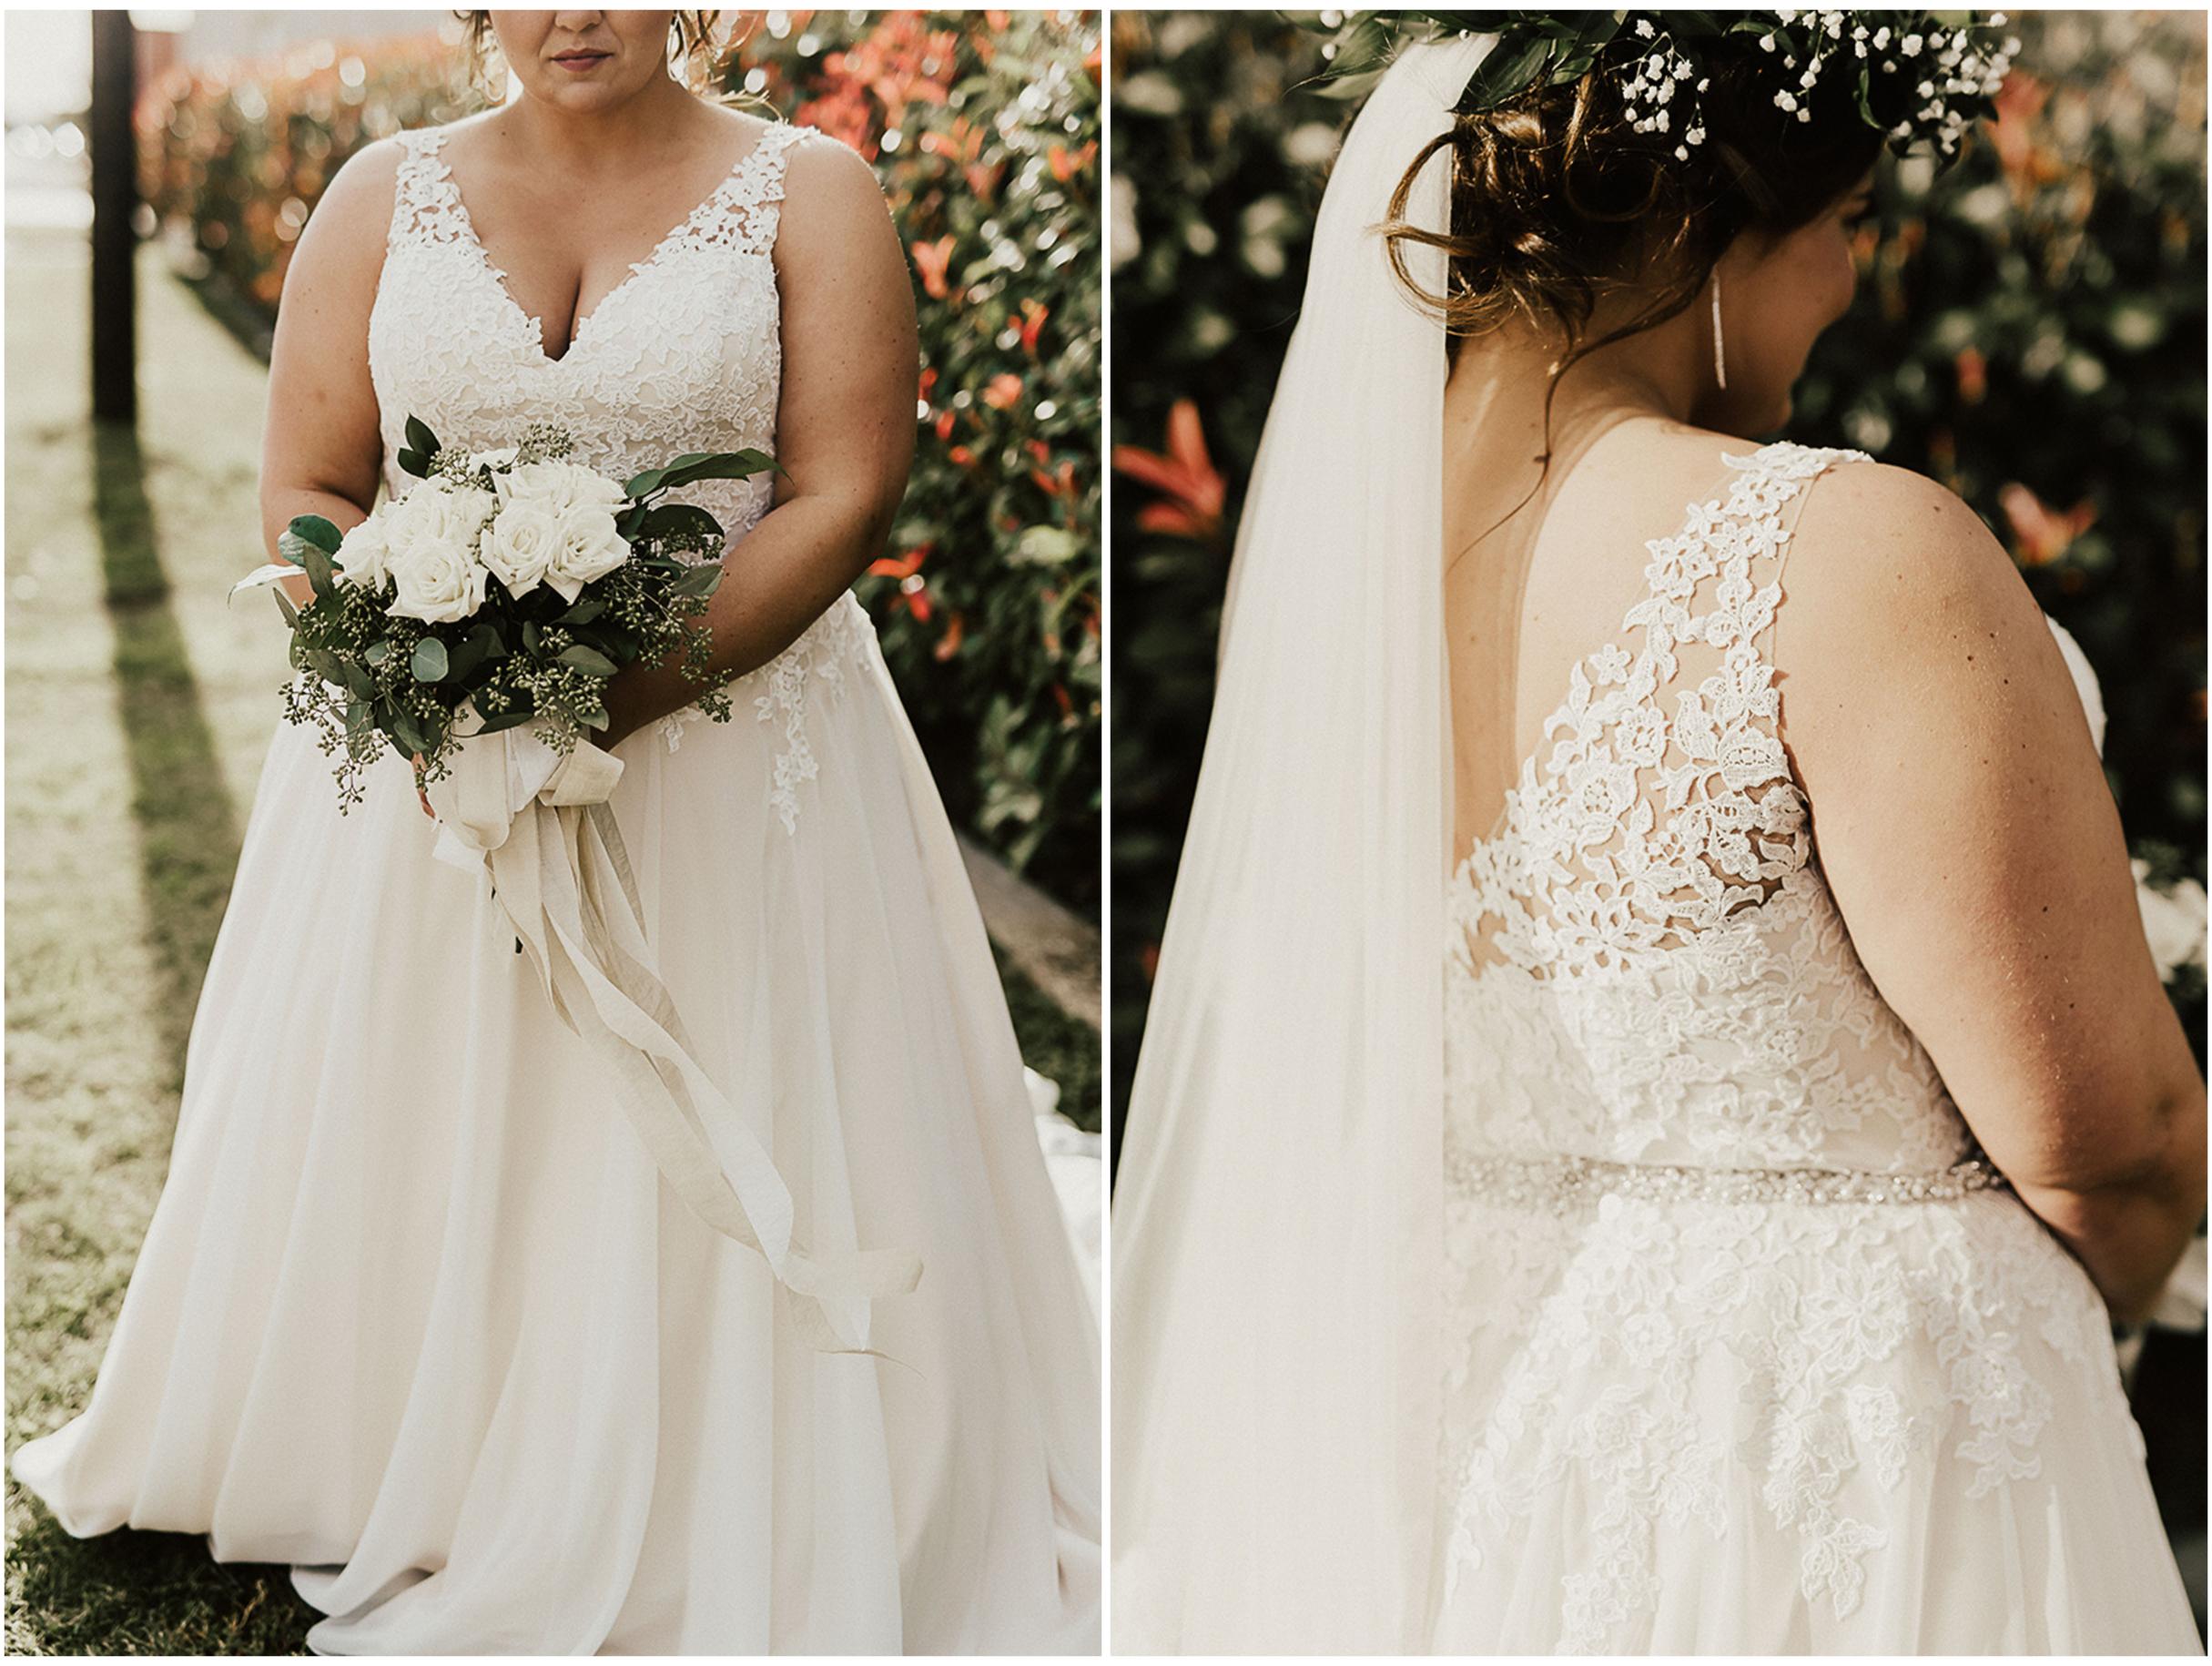 morgan-ben-the-phoenix-waco-texas-wedding-photographer-8.jpg